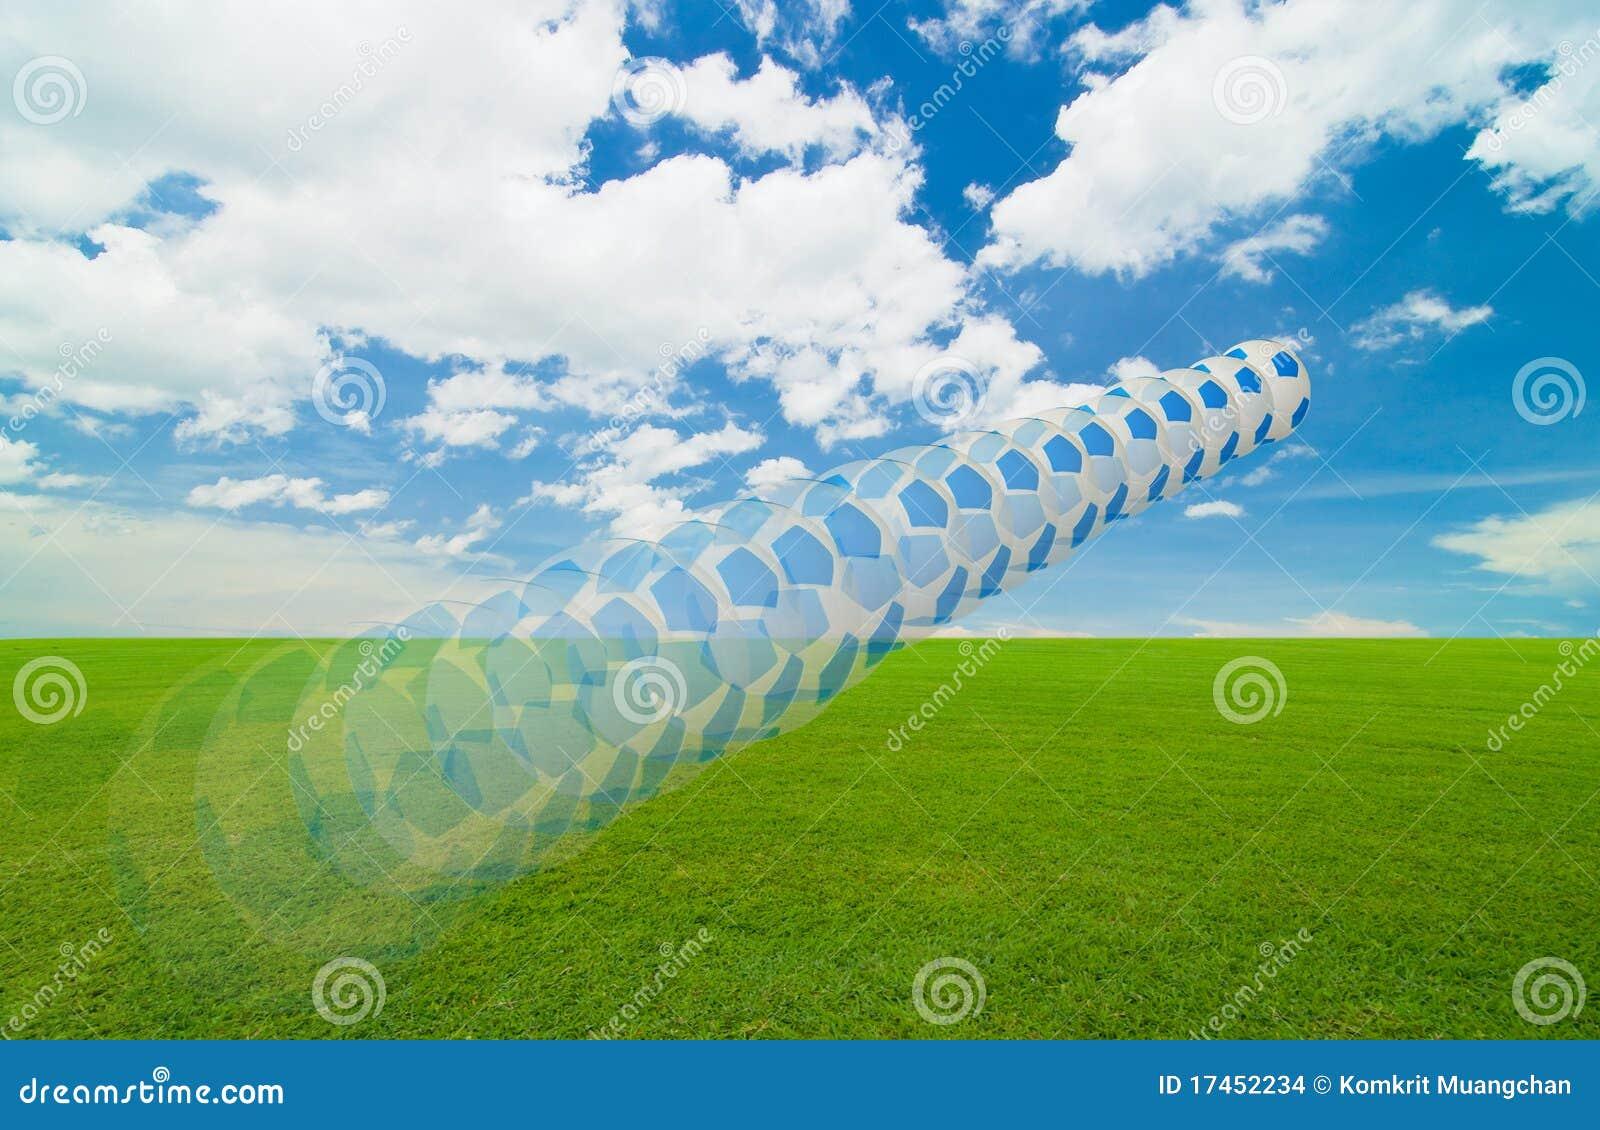 Soccer under the blue sky